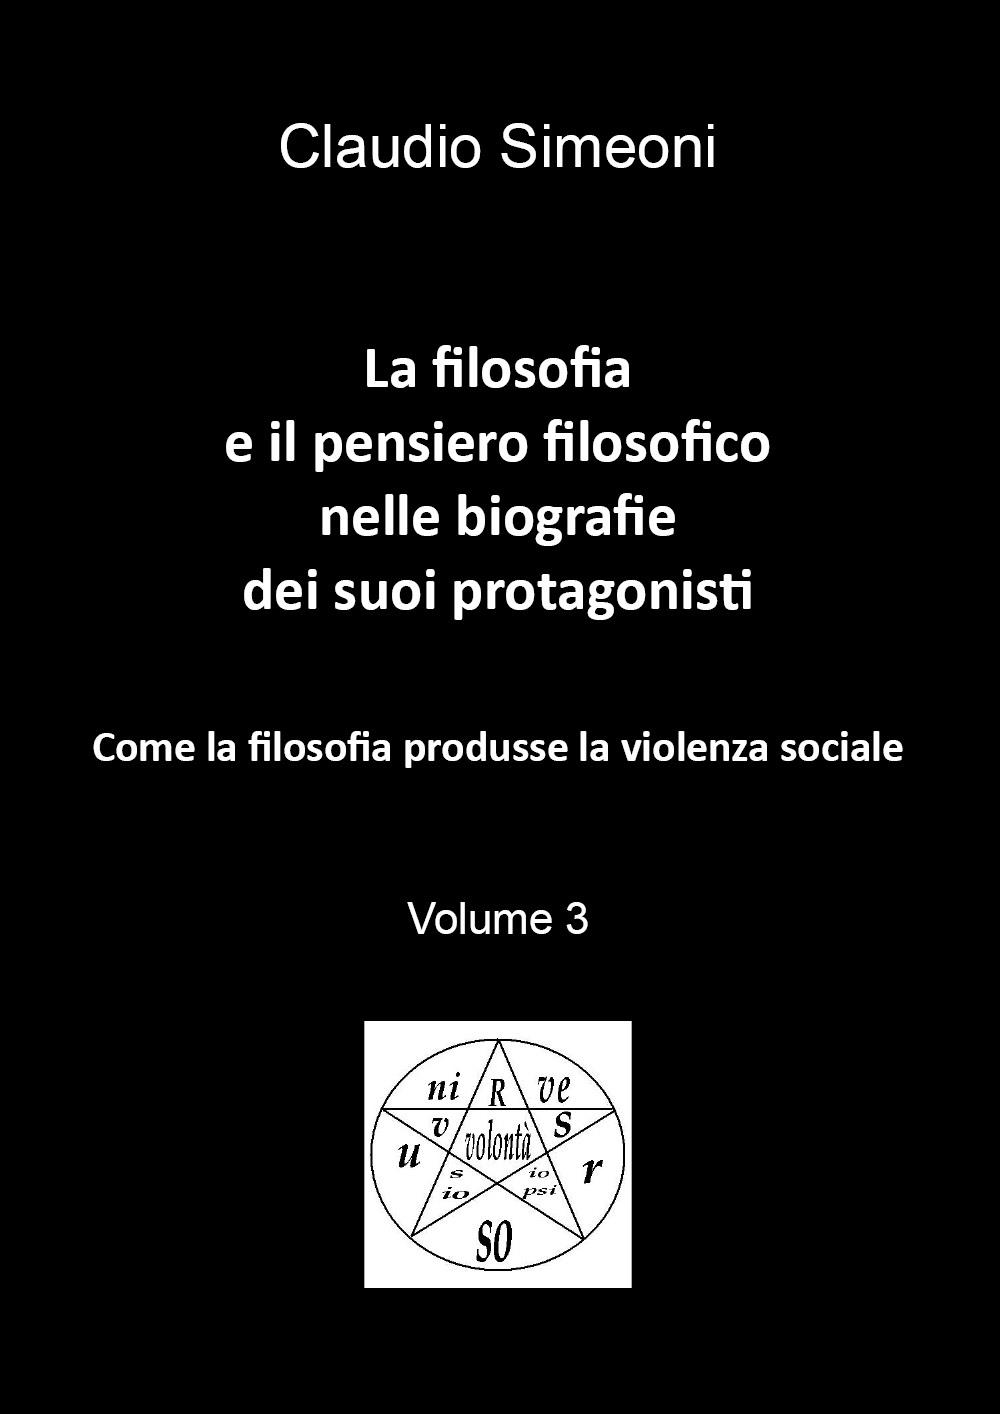 La filosofia e il pensiero filosofico nelle biografie dei suoi protagonisti - volume 3